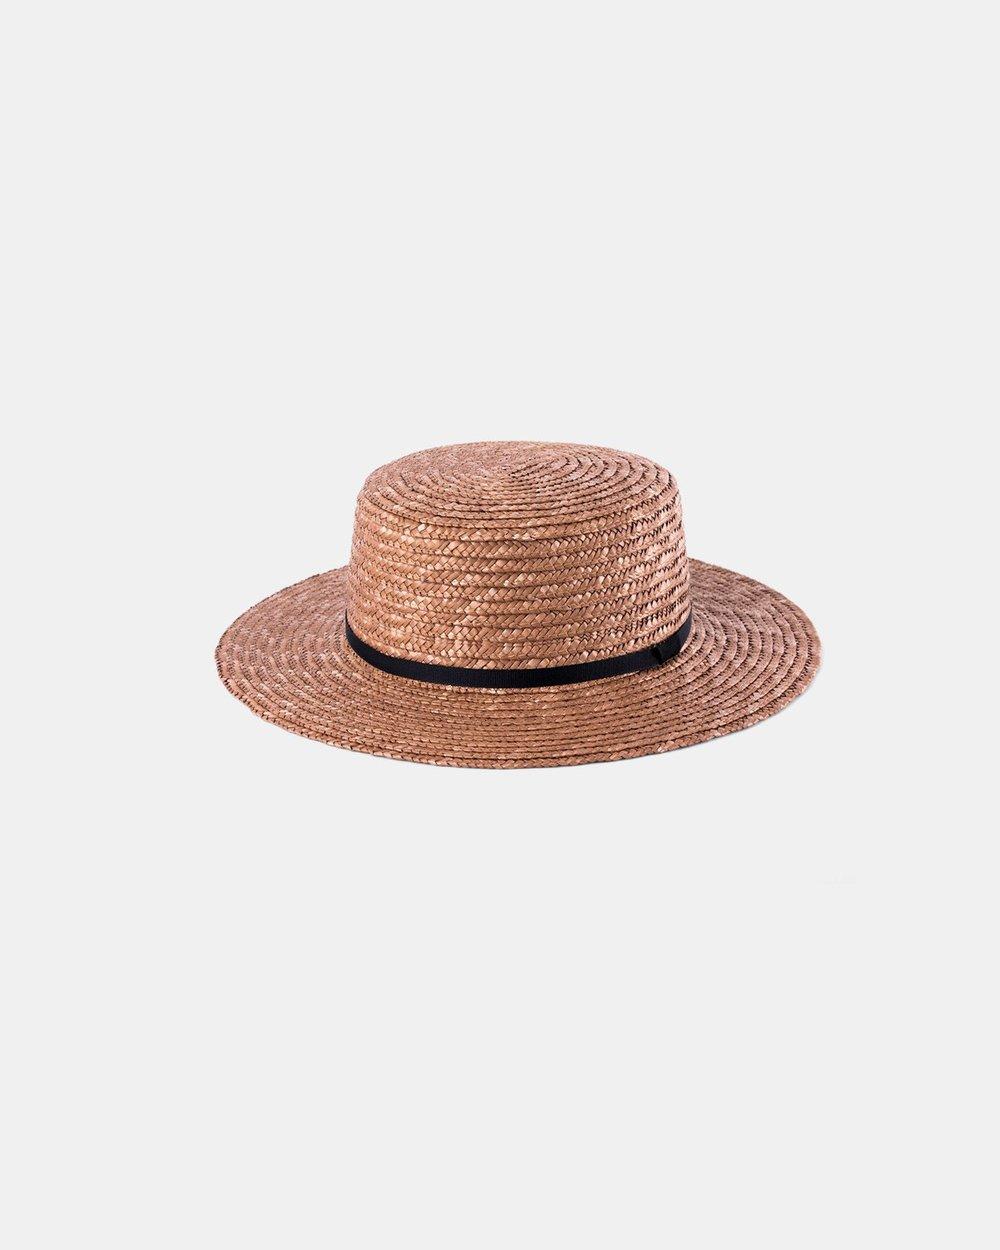 will-and-bear-harvey-amber-straw-hat-1.jpg